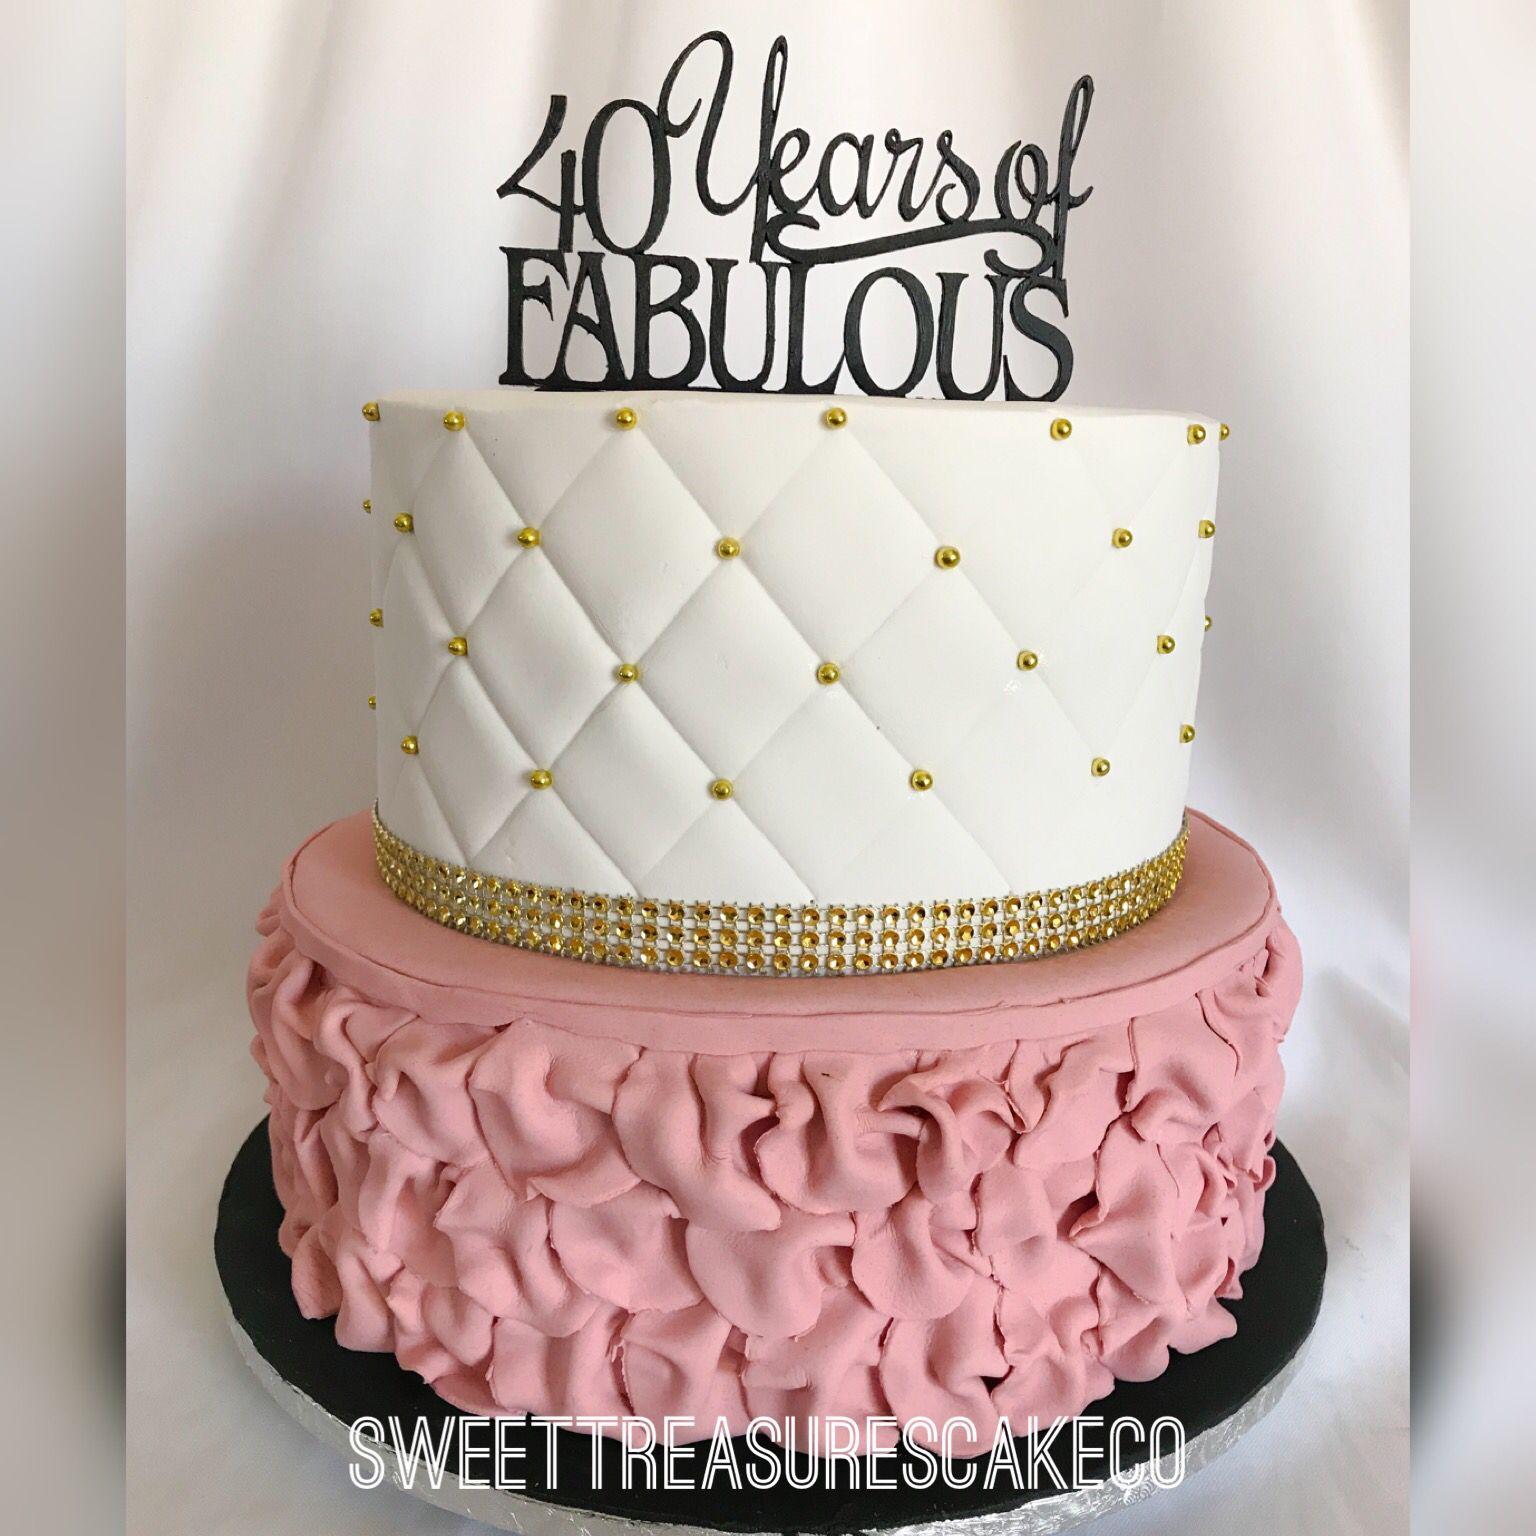 Fabulous 40 Years Of Fabulous Sweettreasures Sweettreasurescakeco Funny Birthday Cards Online Kookostrdamsfinfo